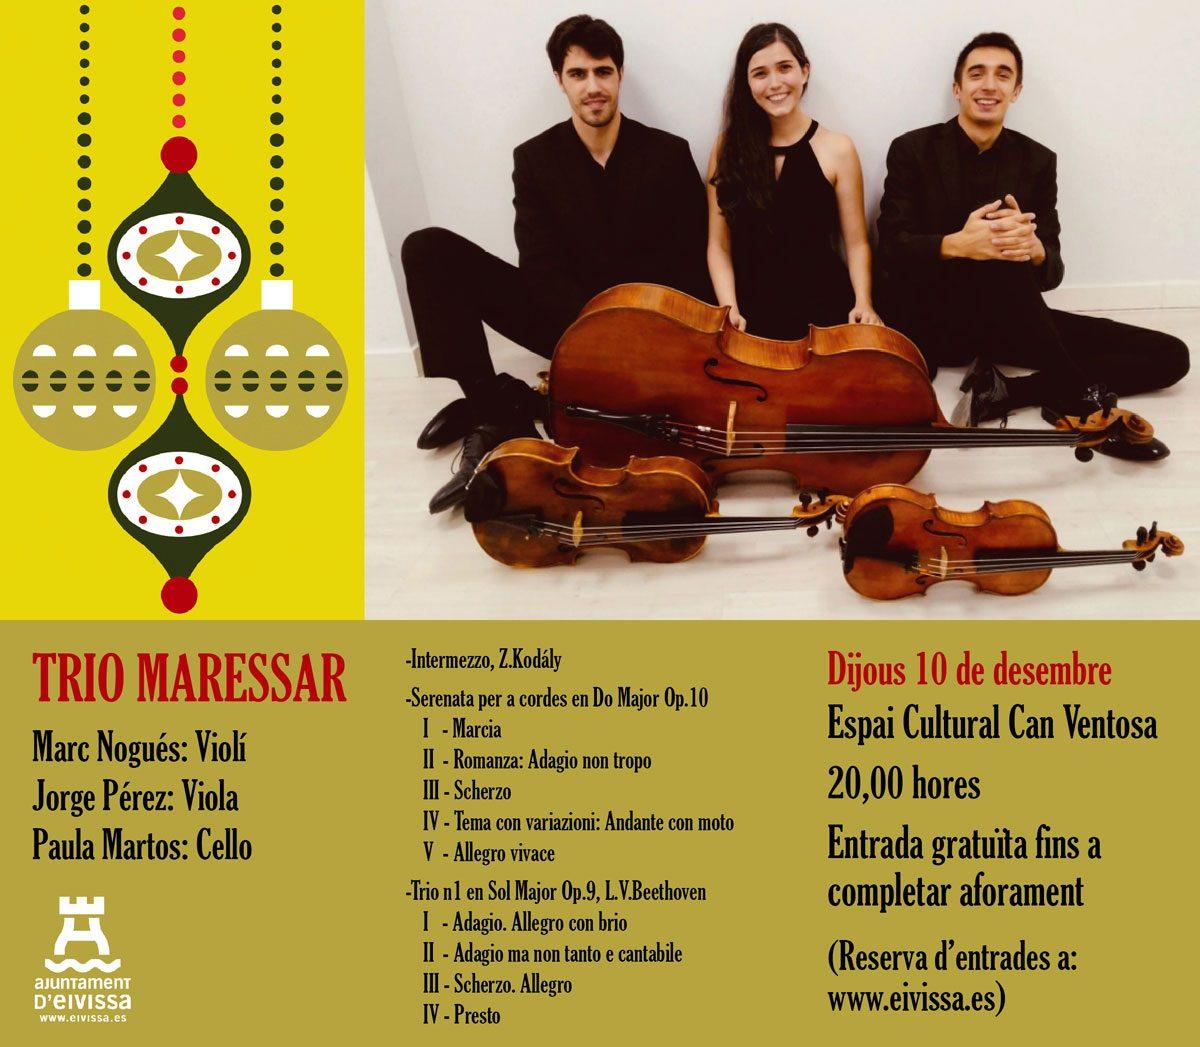 concert-Maressar-can-ventosa-Eivissa-2020-welcometoibiza